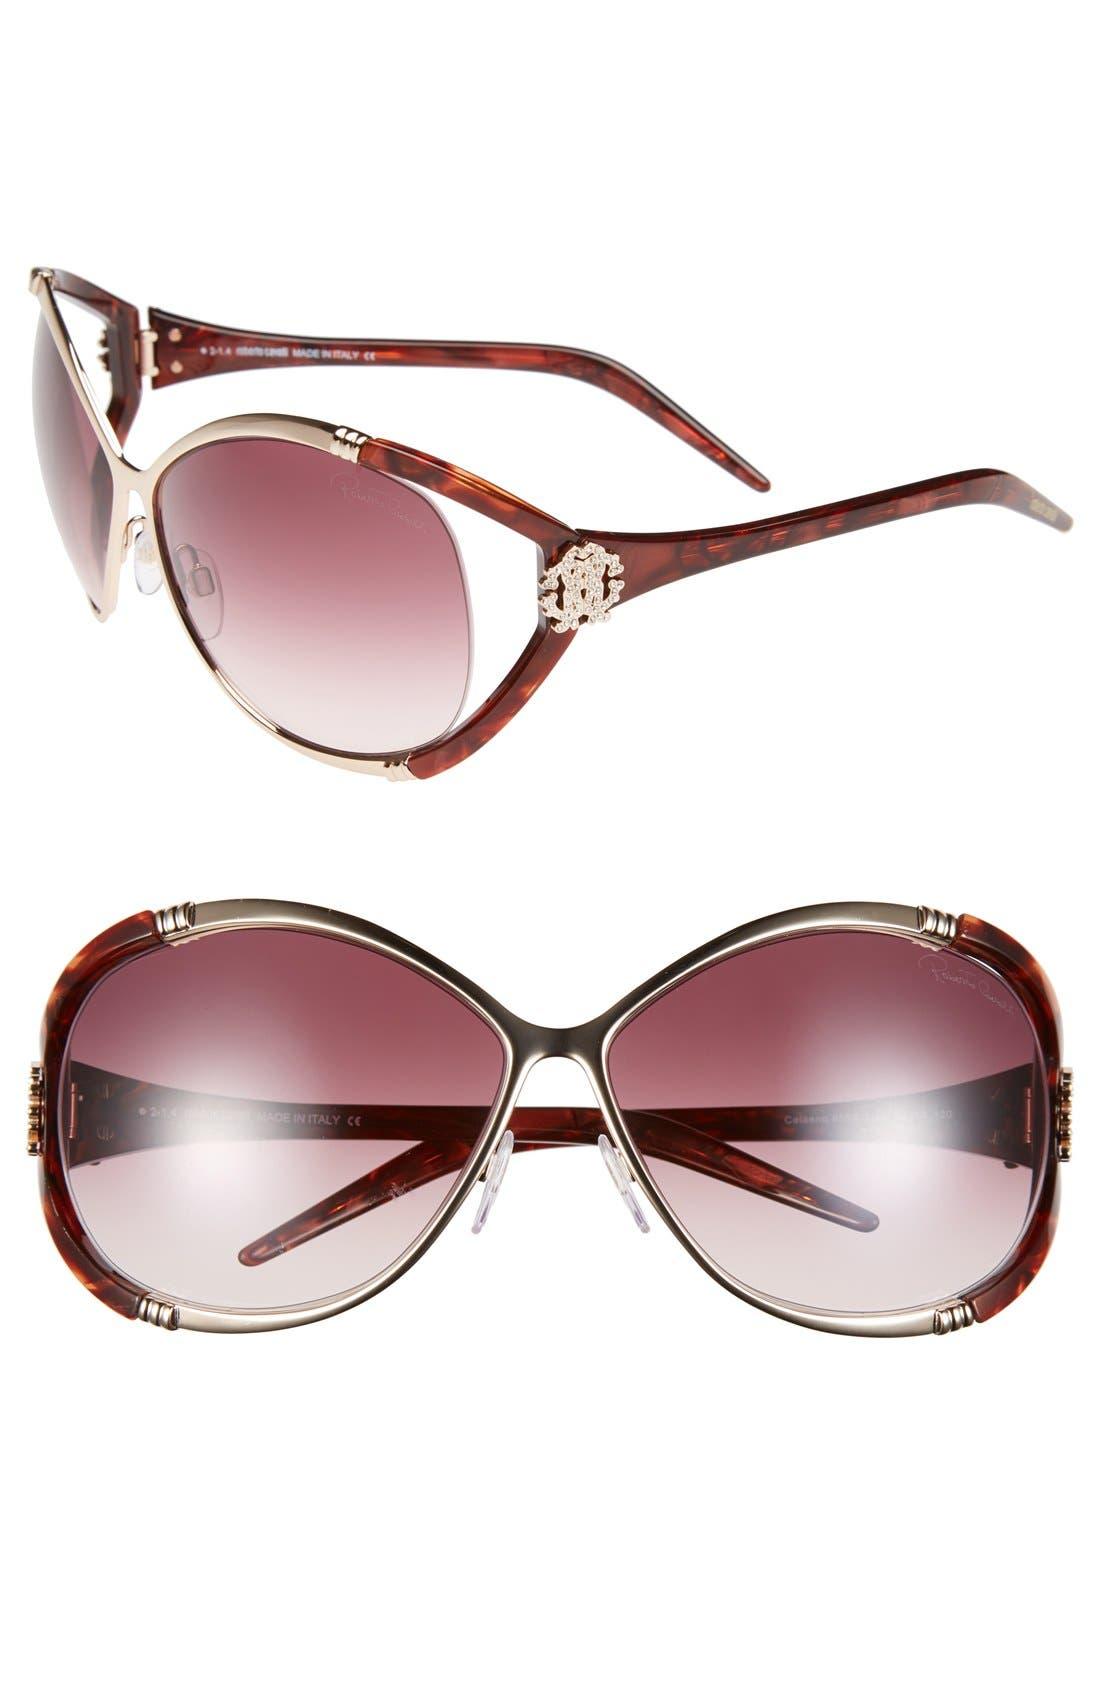 Main Image - Roberto Cavalli 'Celaeno - Glam Couture' 66mm Sunglasses